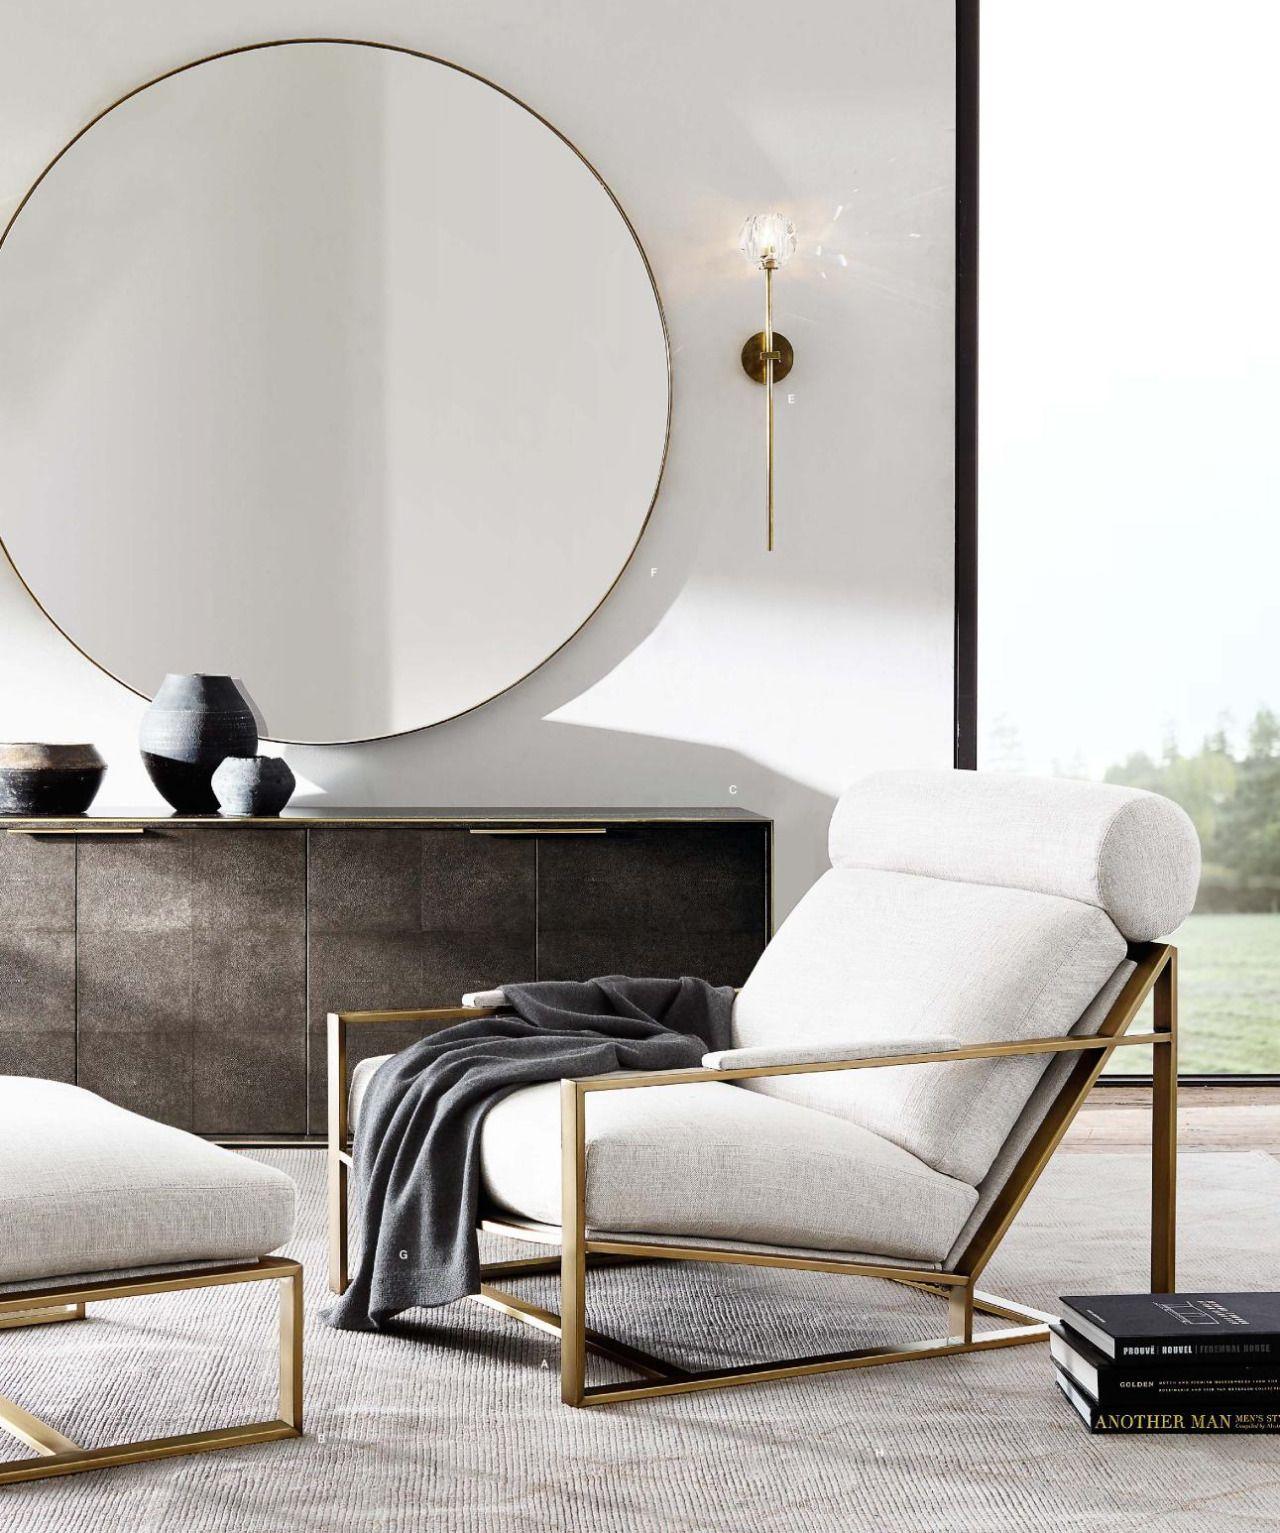 Case Moderne Interni Tendenze Maison Design